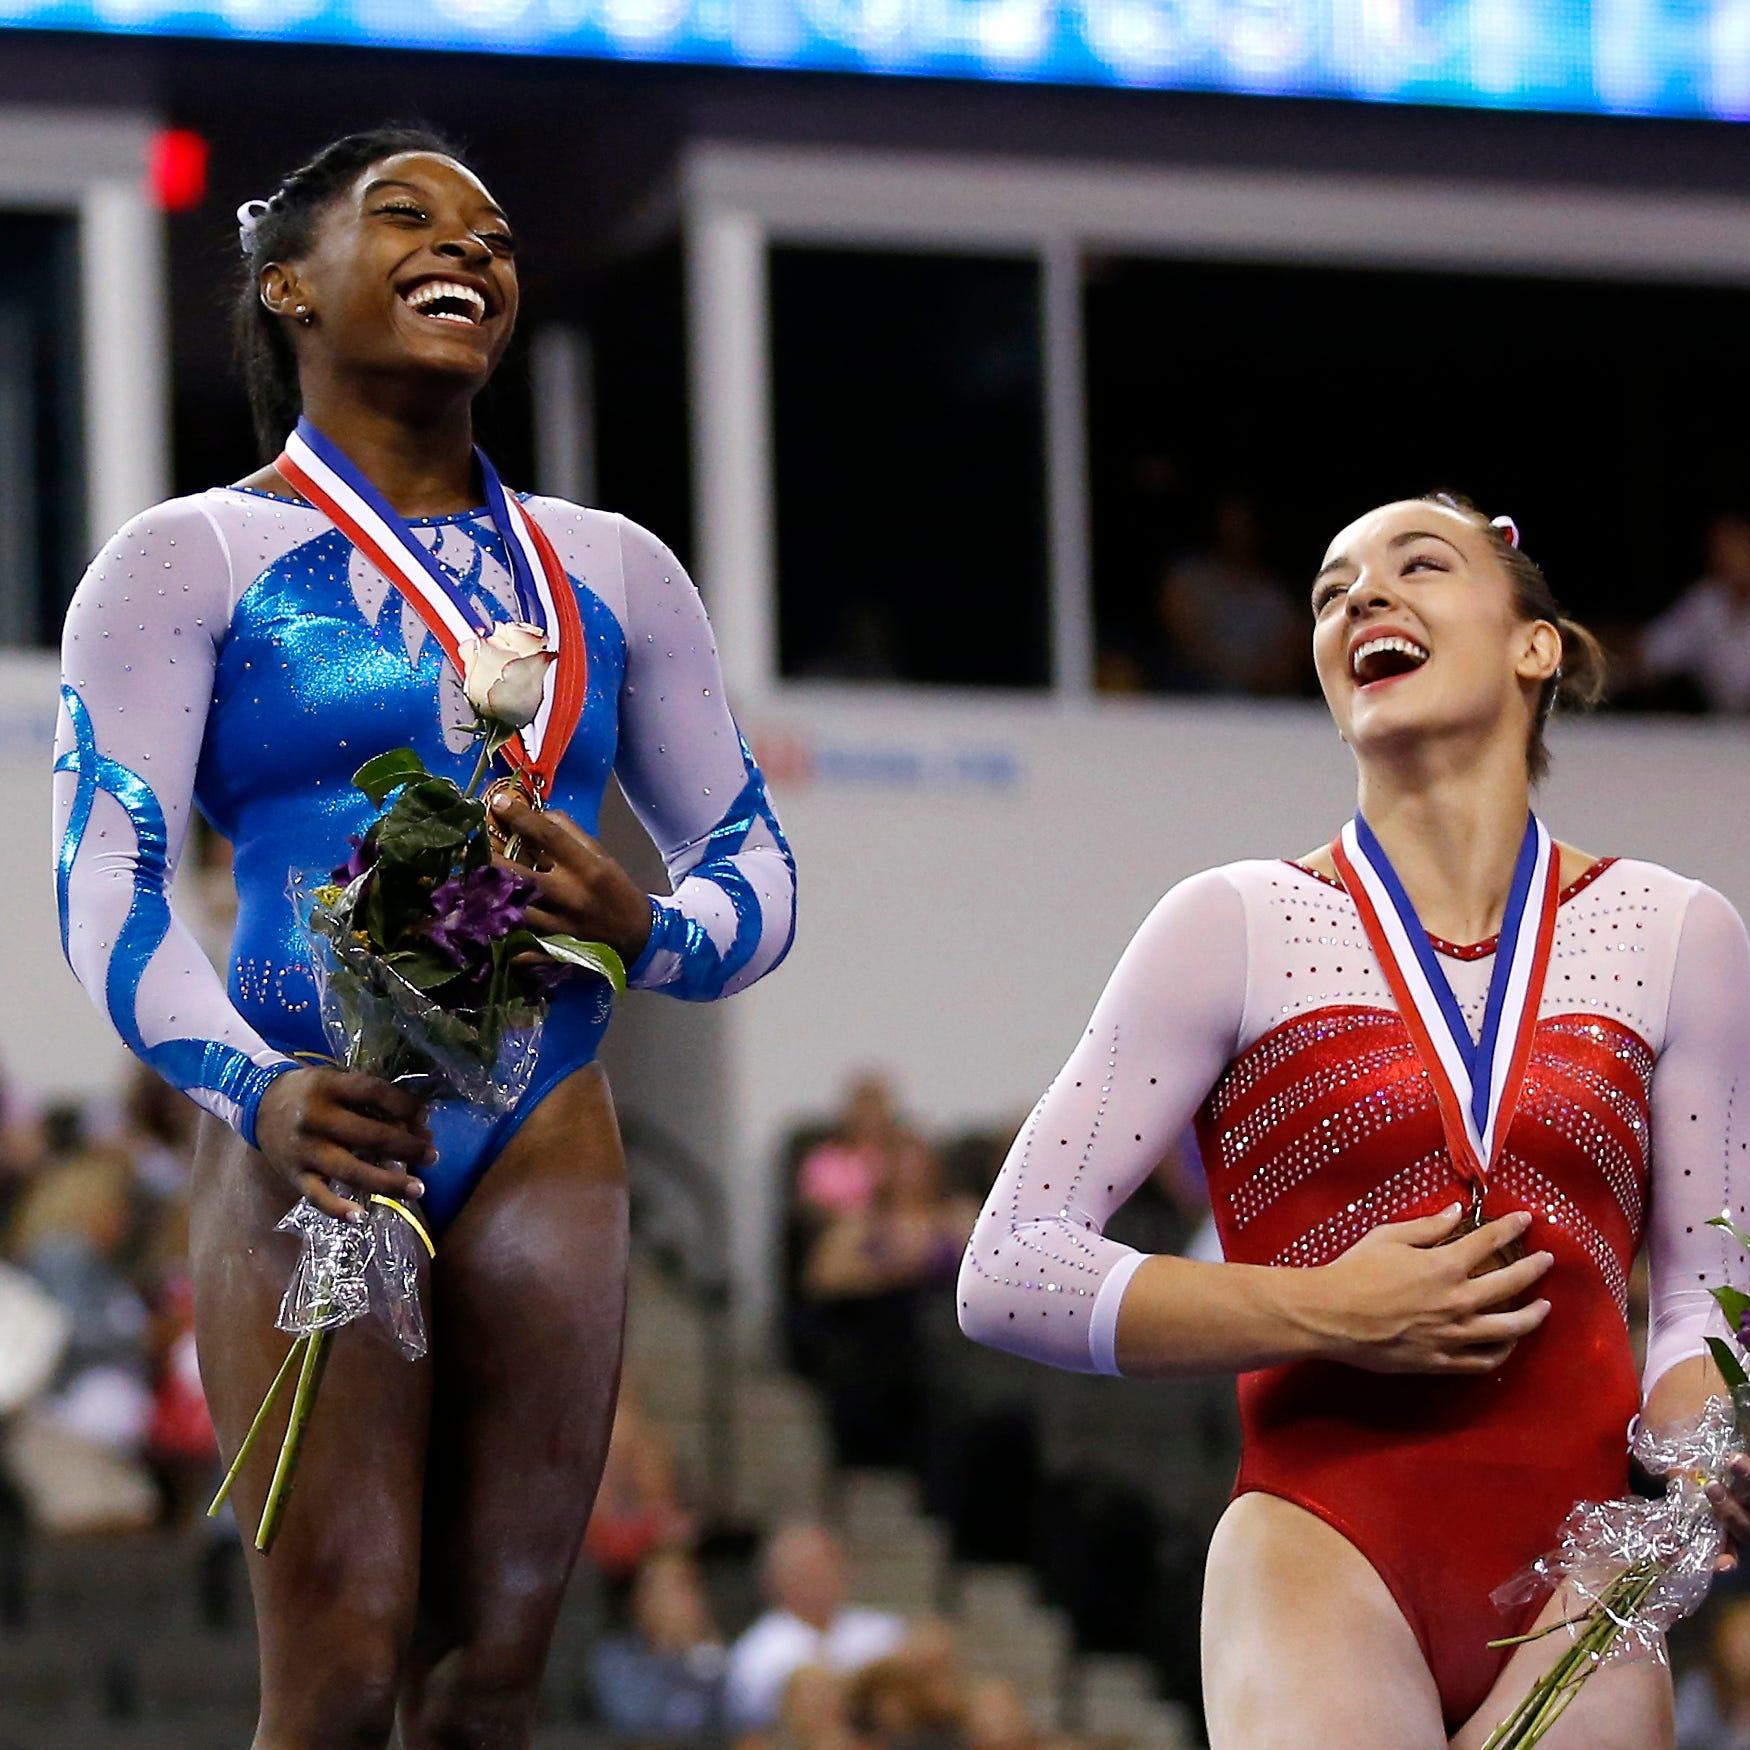 Simone Biles criticizes new gymnastics CEO for anti-Nike tweet